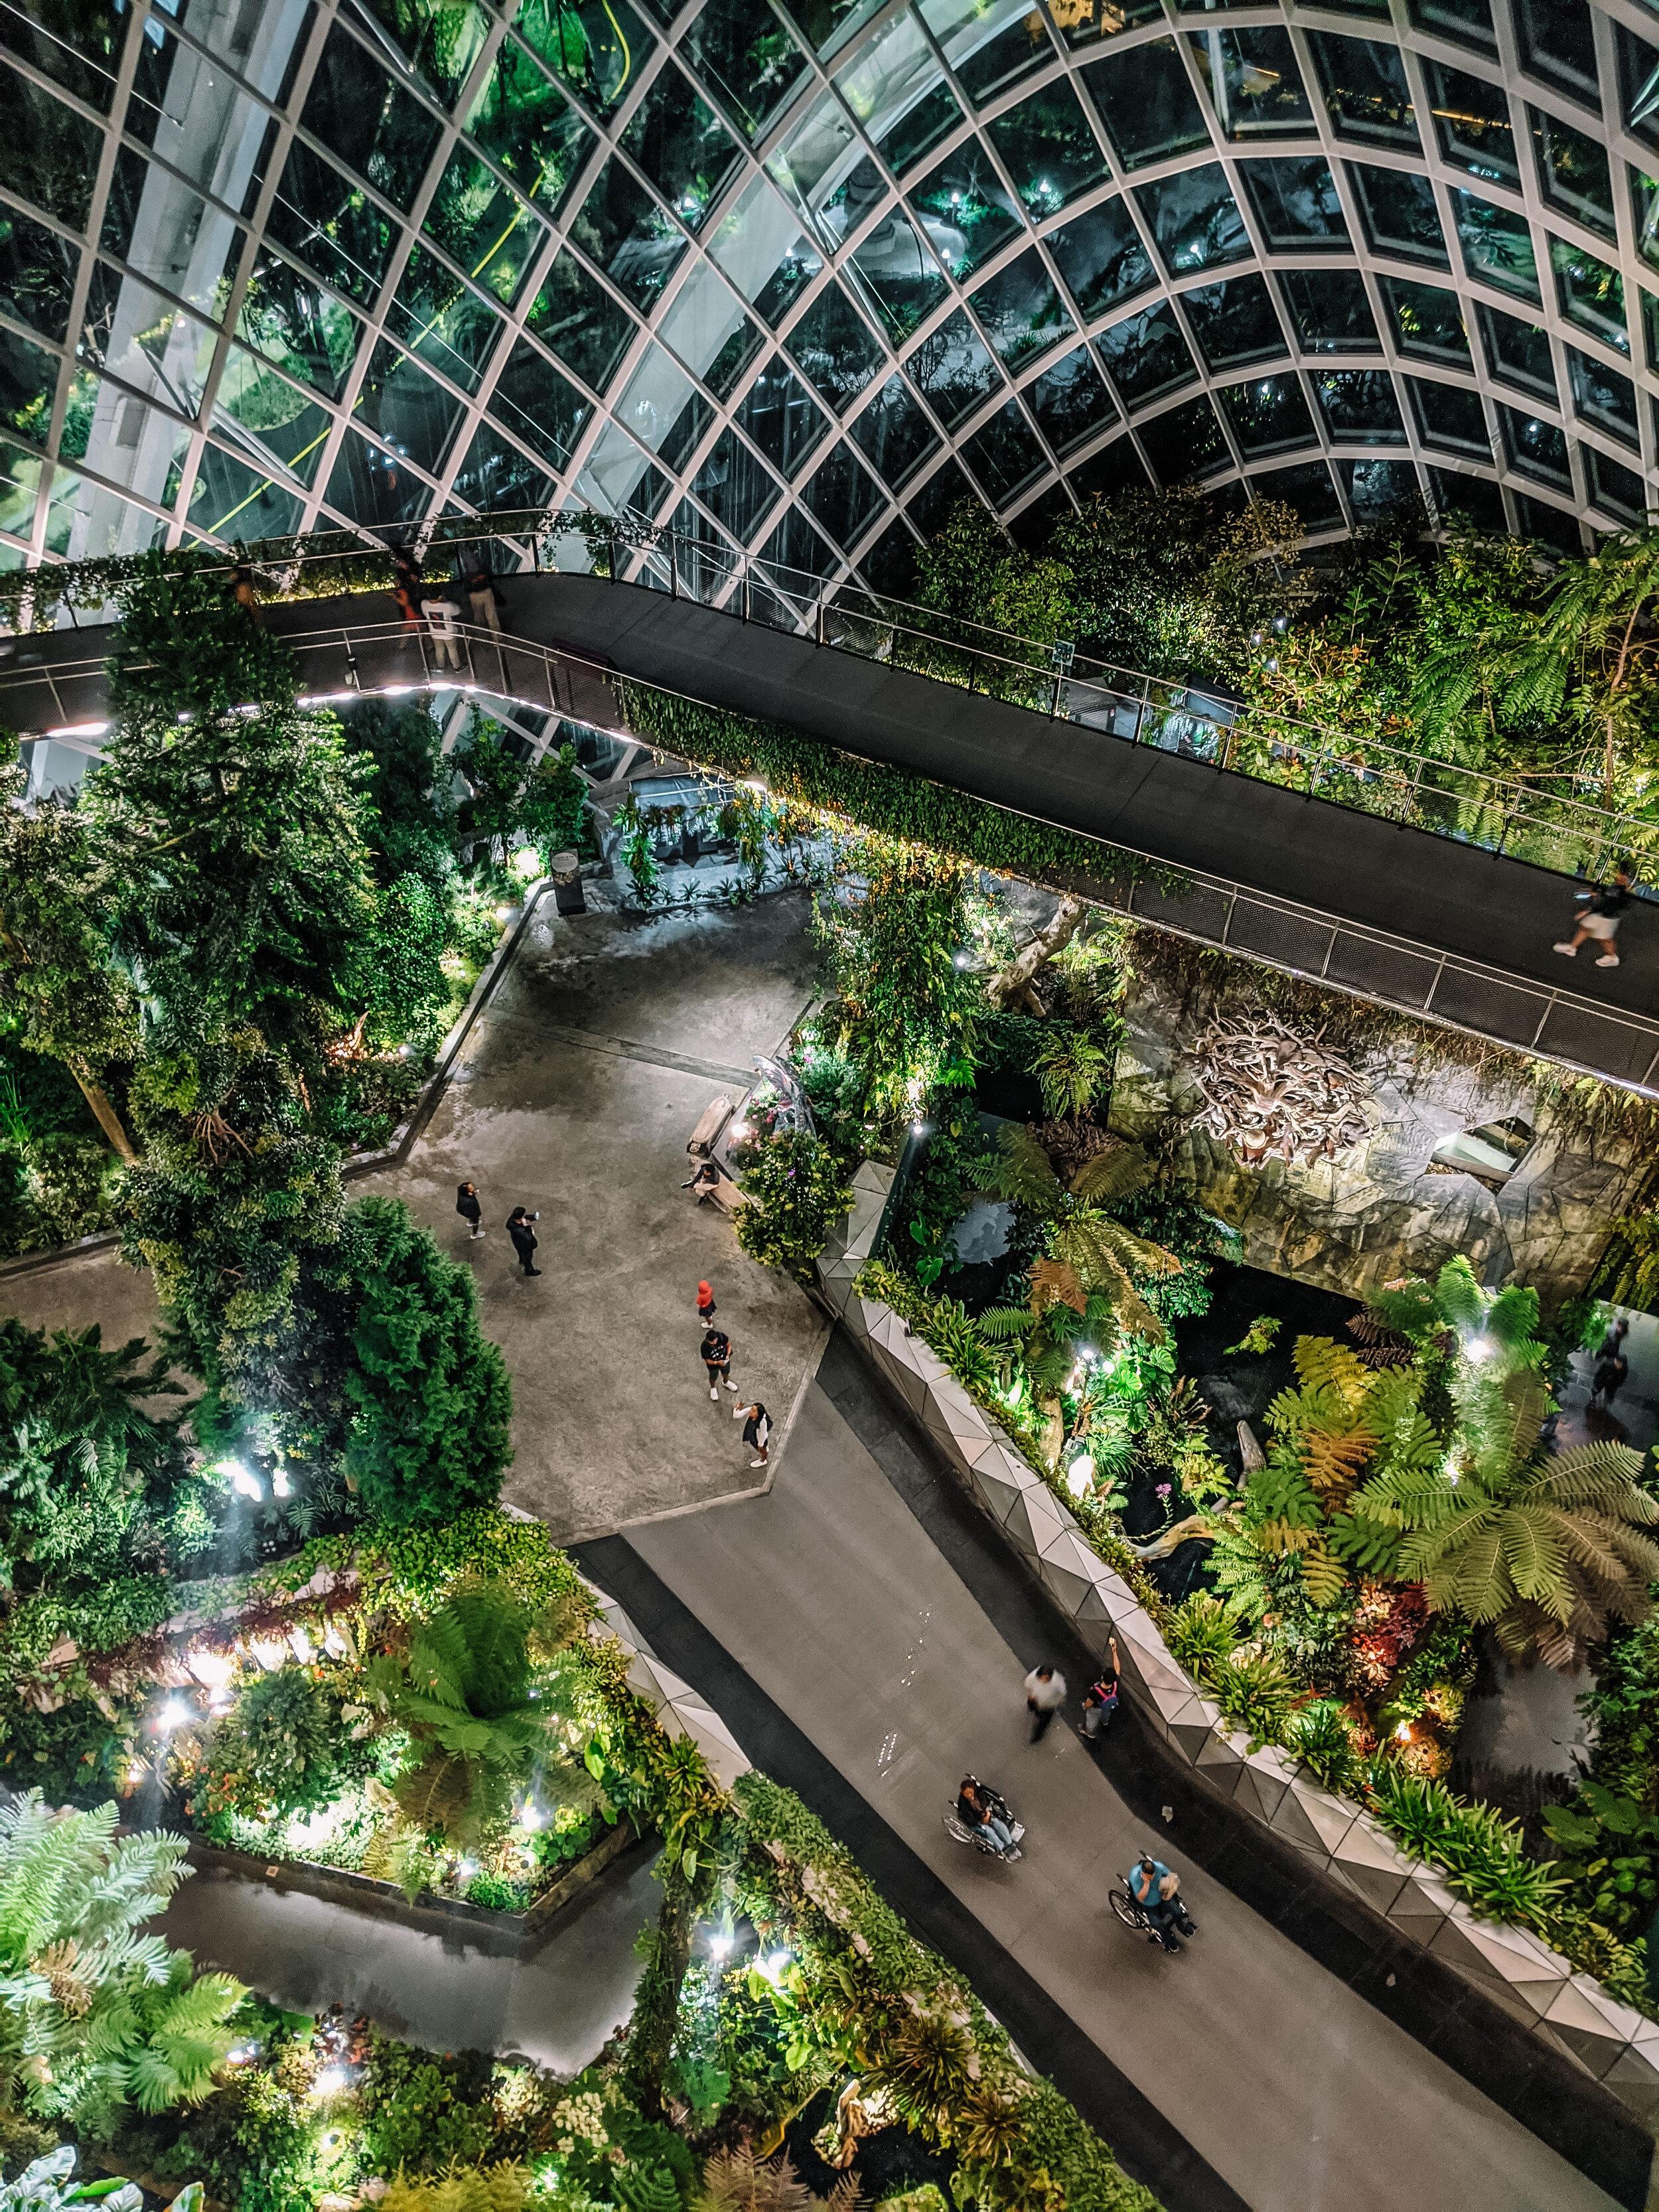 Rachel Off Duty: Cloud Forest in Gardens by the Bay